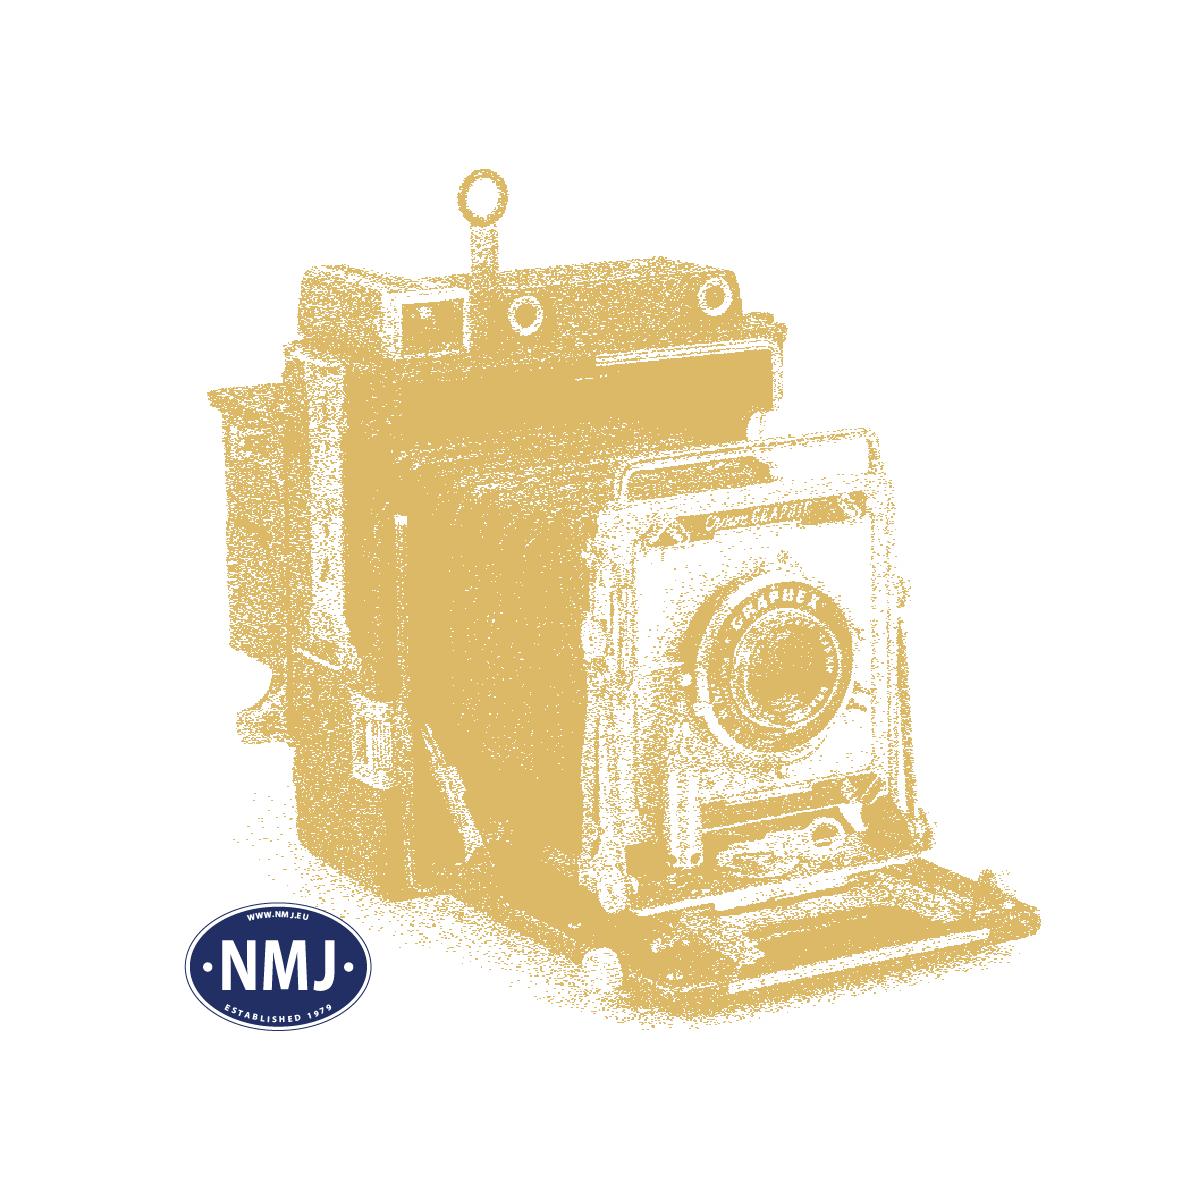 NMJT81.993 - NSB BM 73 Beleuchtungsset 3 teilig